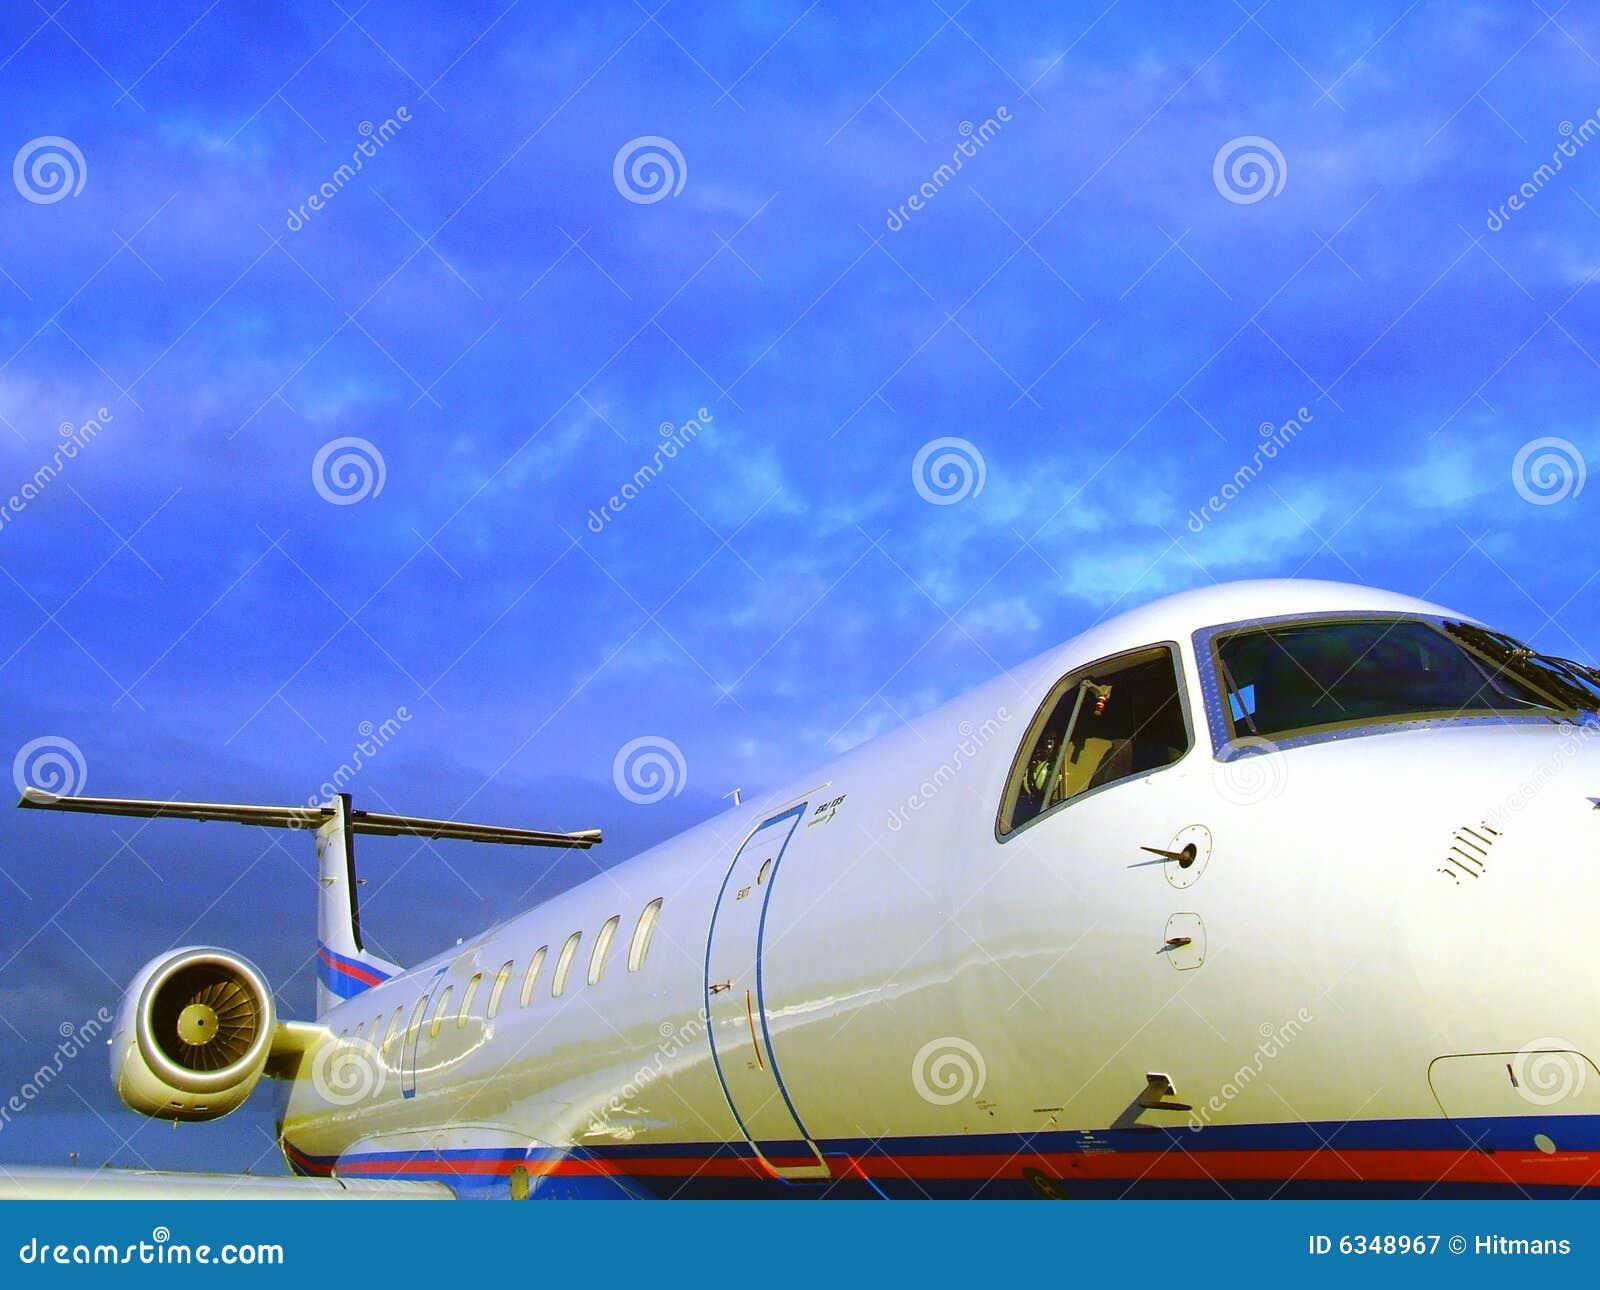 Jet Privato Lussuoso : Aereo privato lussuoso stock photos images